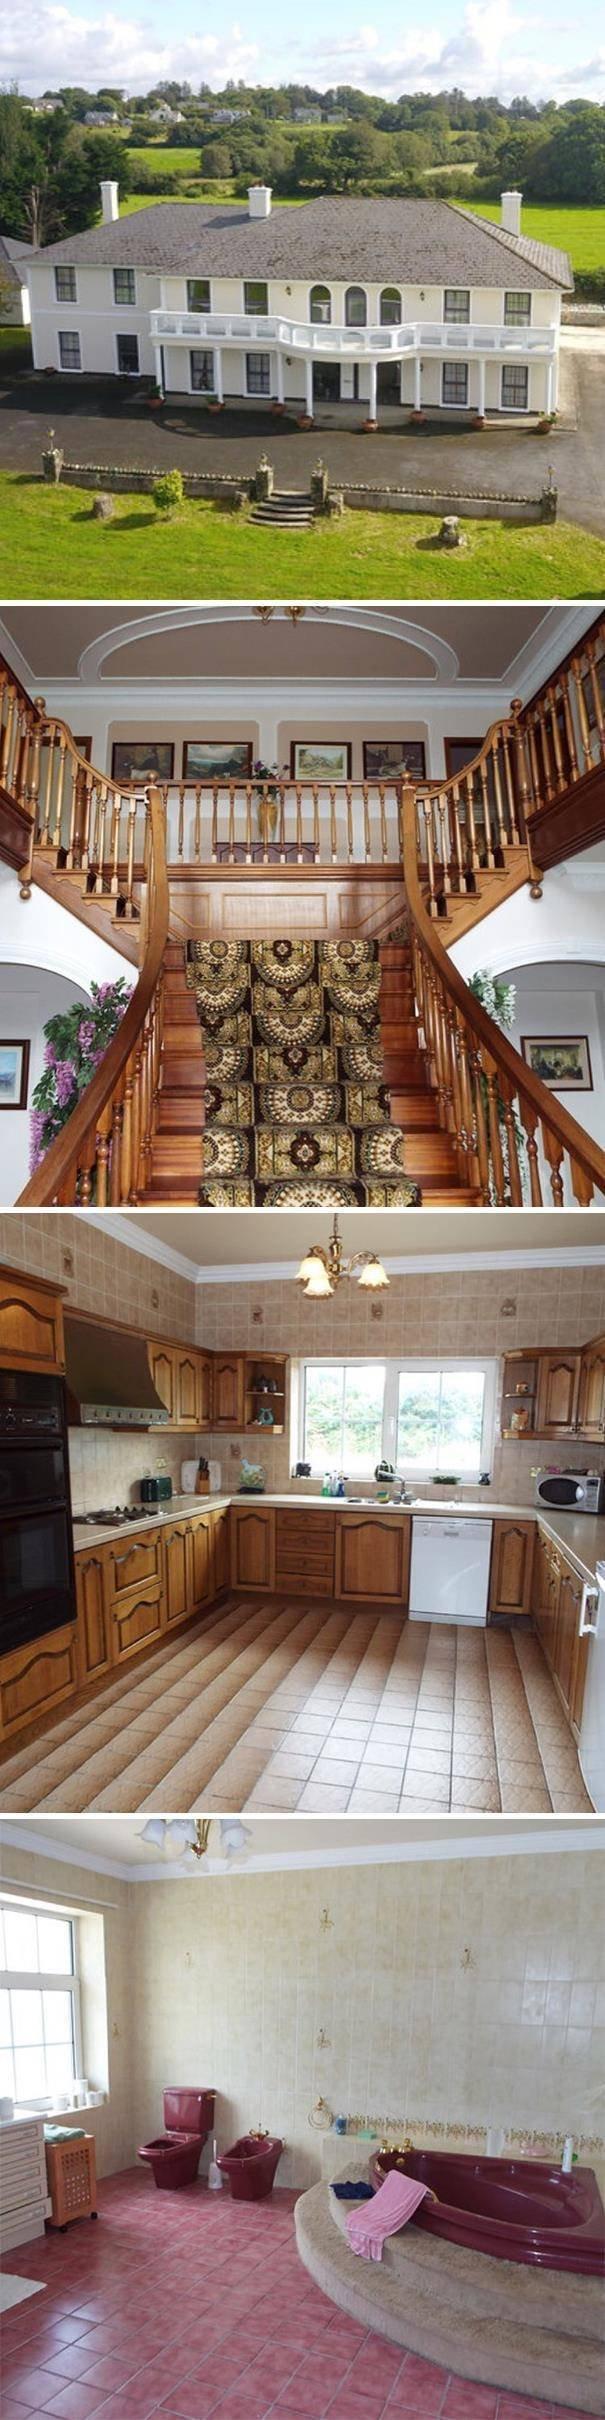 Irish Houses (30 pics)